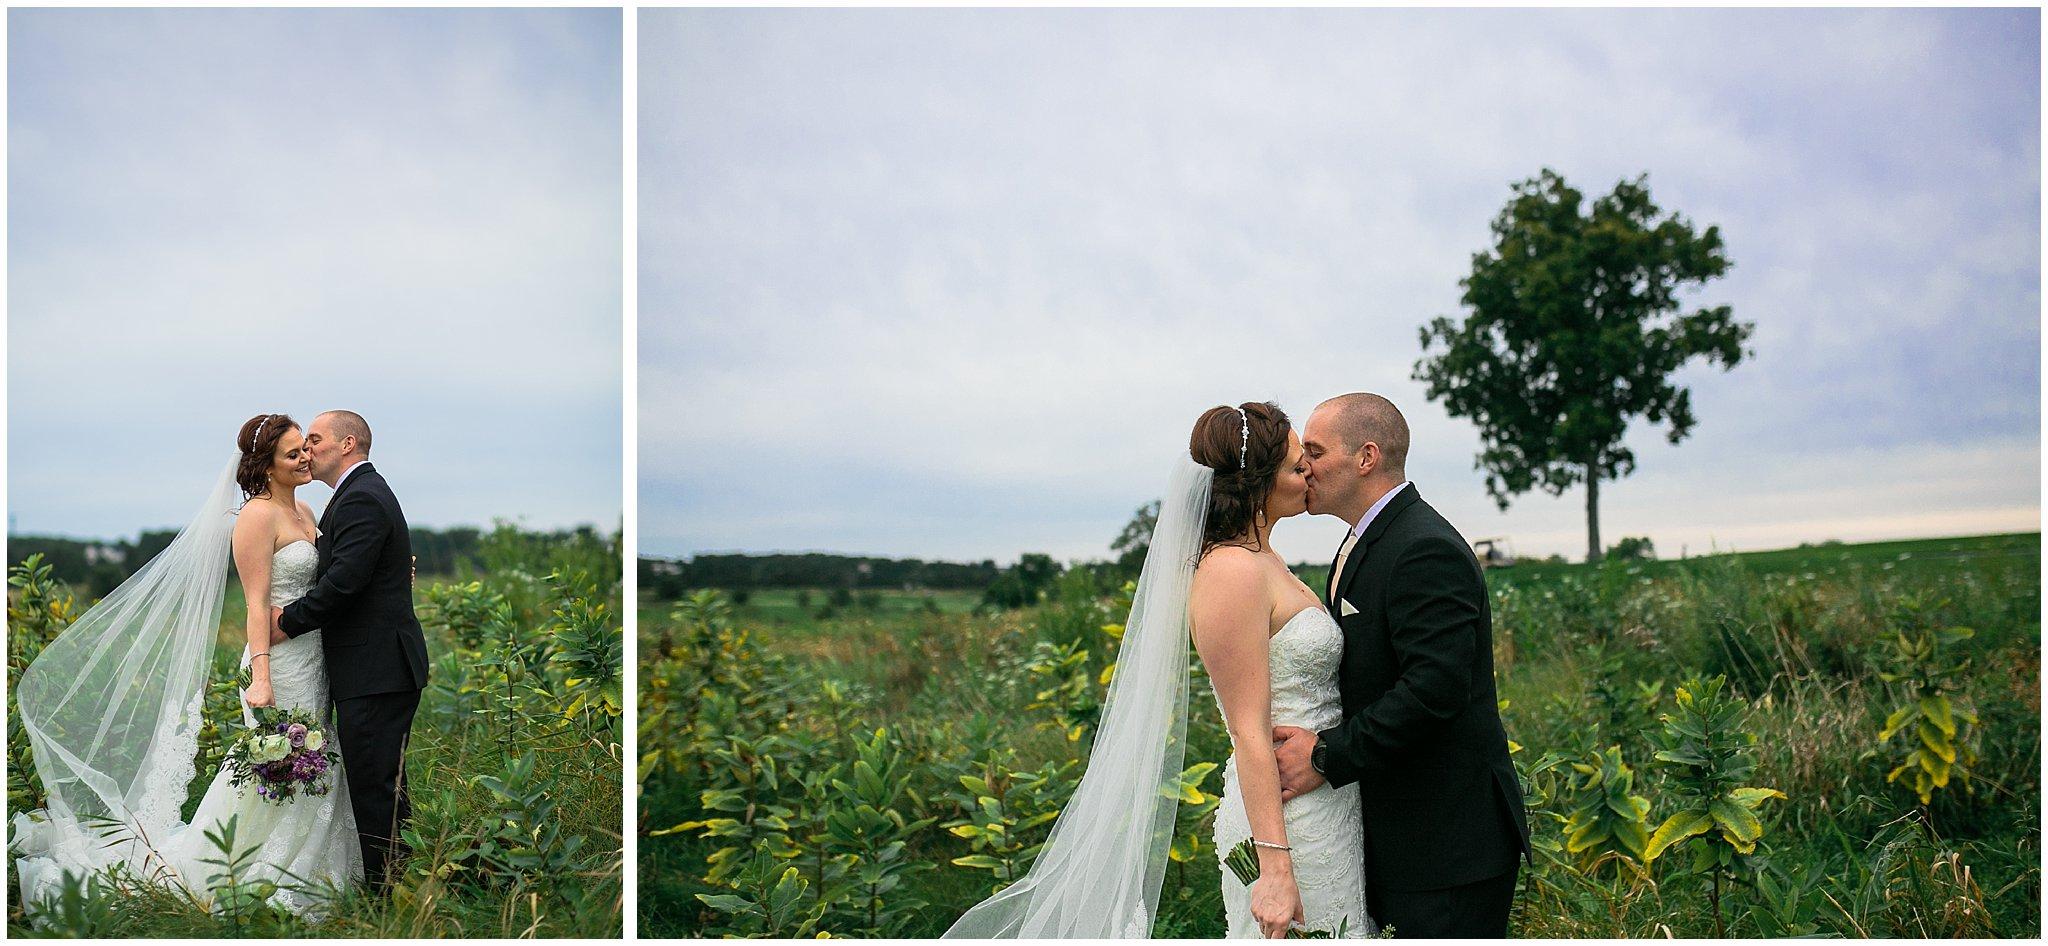 Links at Unionvale Wedding Lagrangeville Wedding Hudson Valley Wedding Photographer Sweet Alice Photography51.jpg